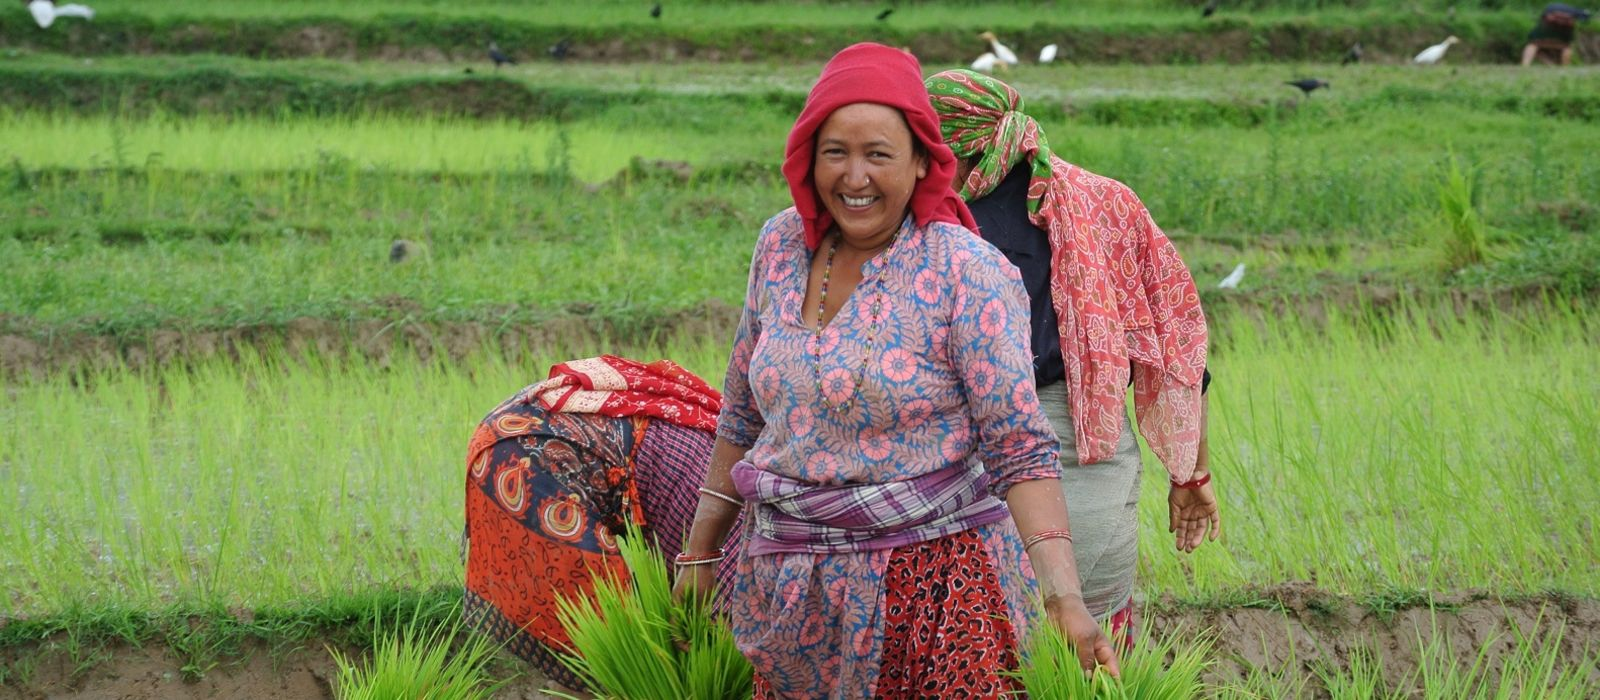 Roof of the World – Kathmandu and Lhasa Tour Trip 6